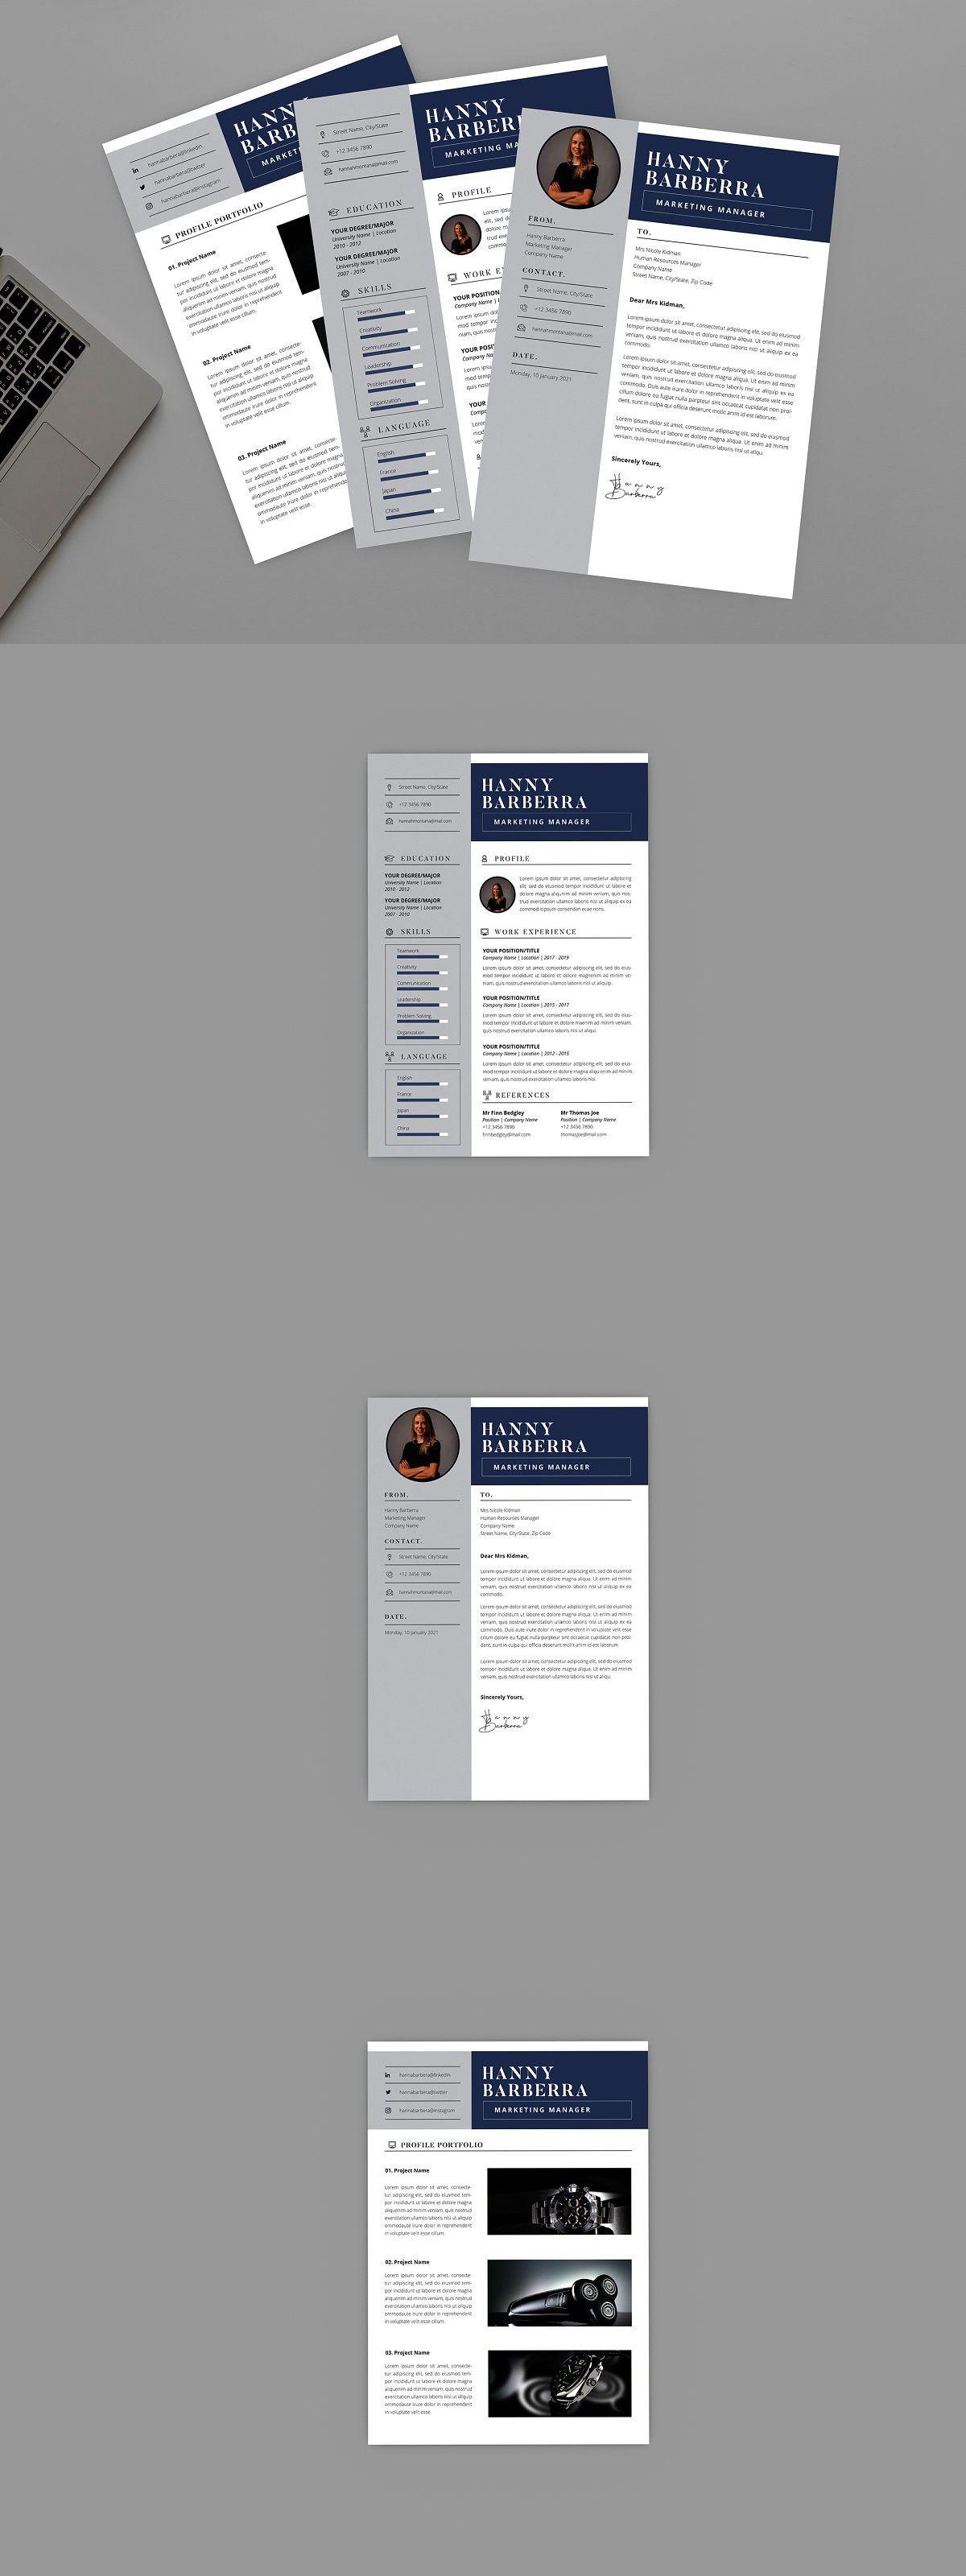 Hanny Marketing Resume Designer in 2020 Marketing resume